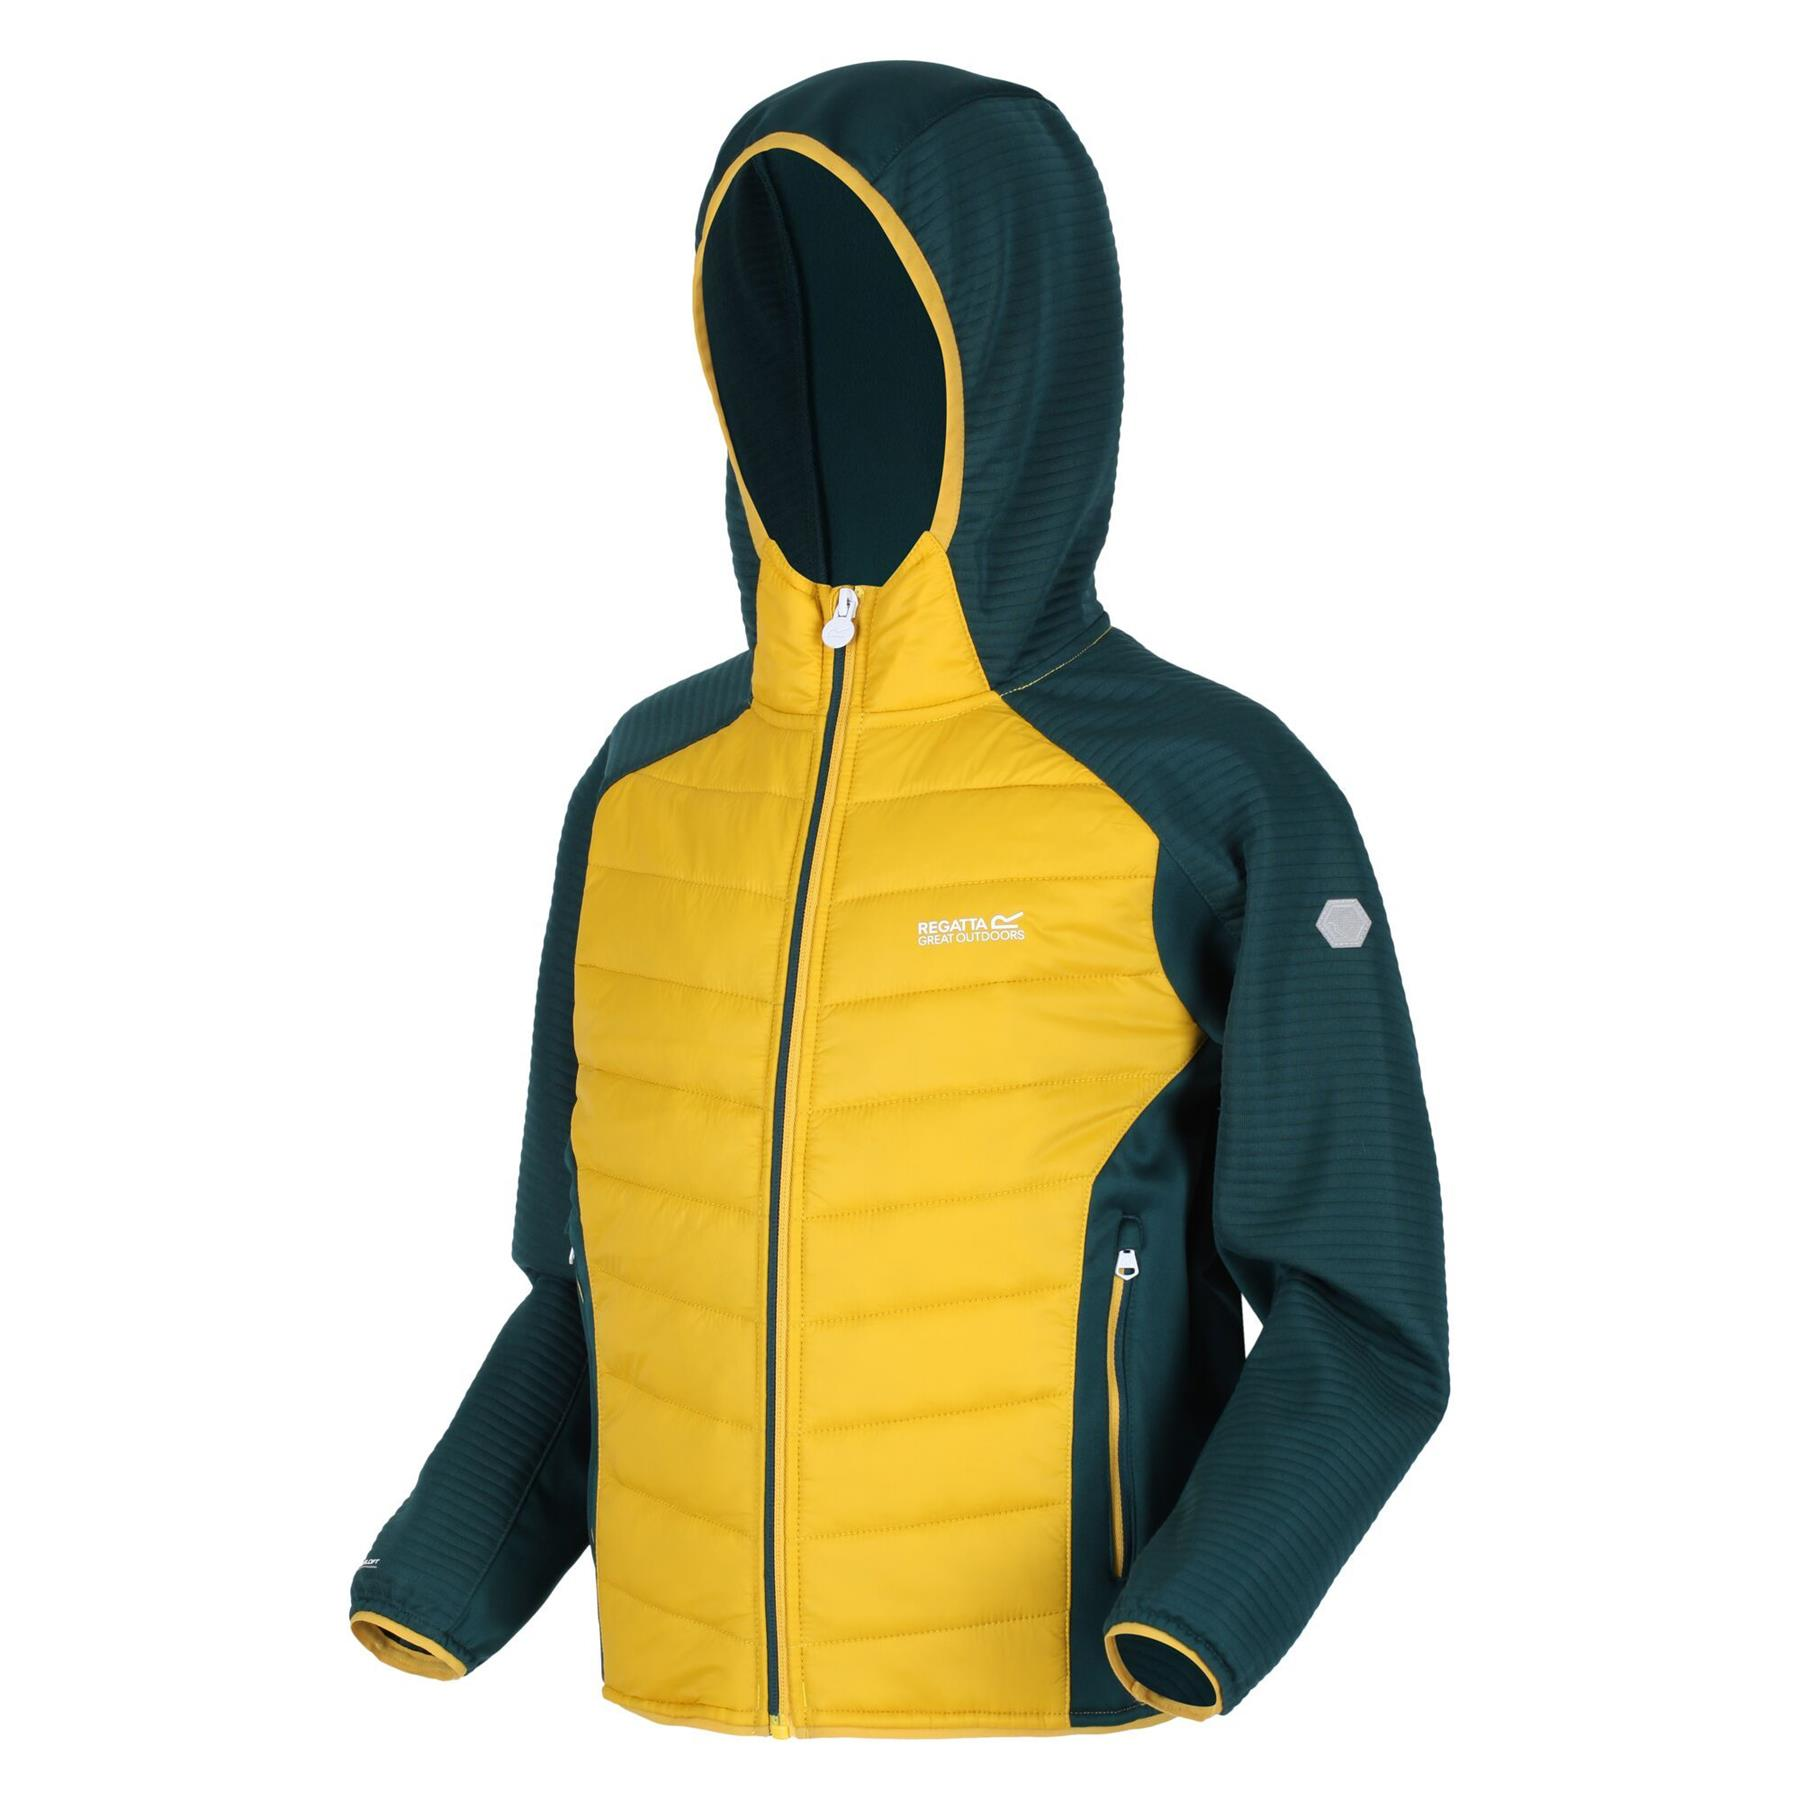 miniatuur 8 - Regatta Kids Kielder IV Lightweight Hybrid Softshell Jacket Boys Girls Coat